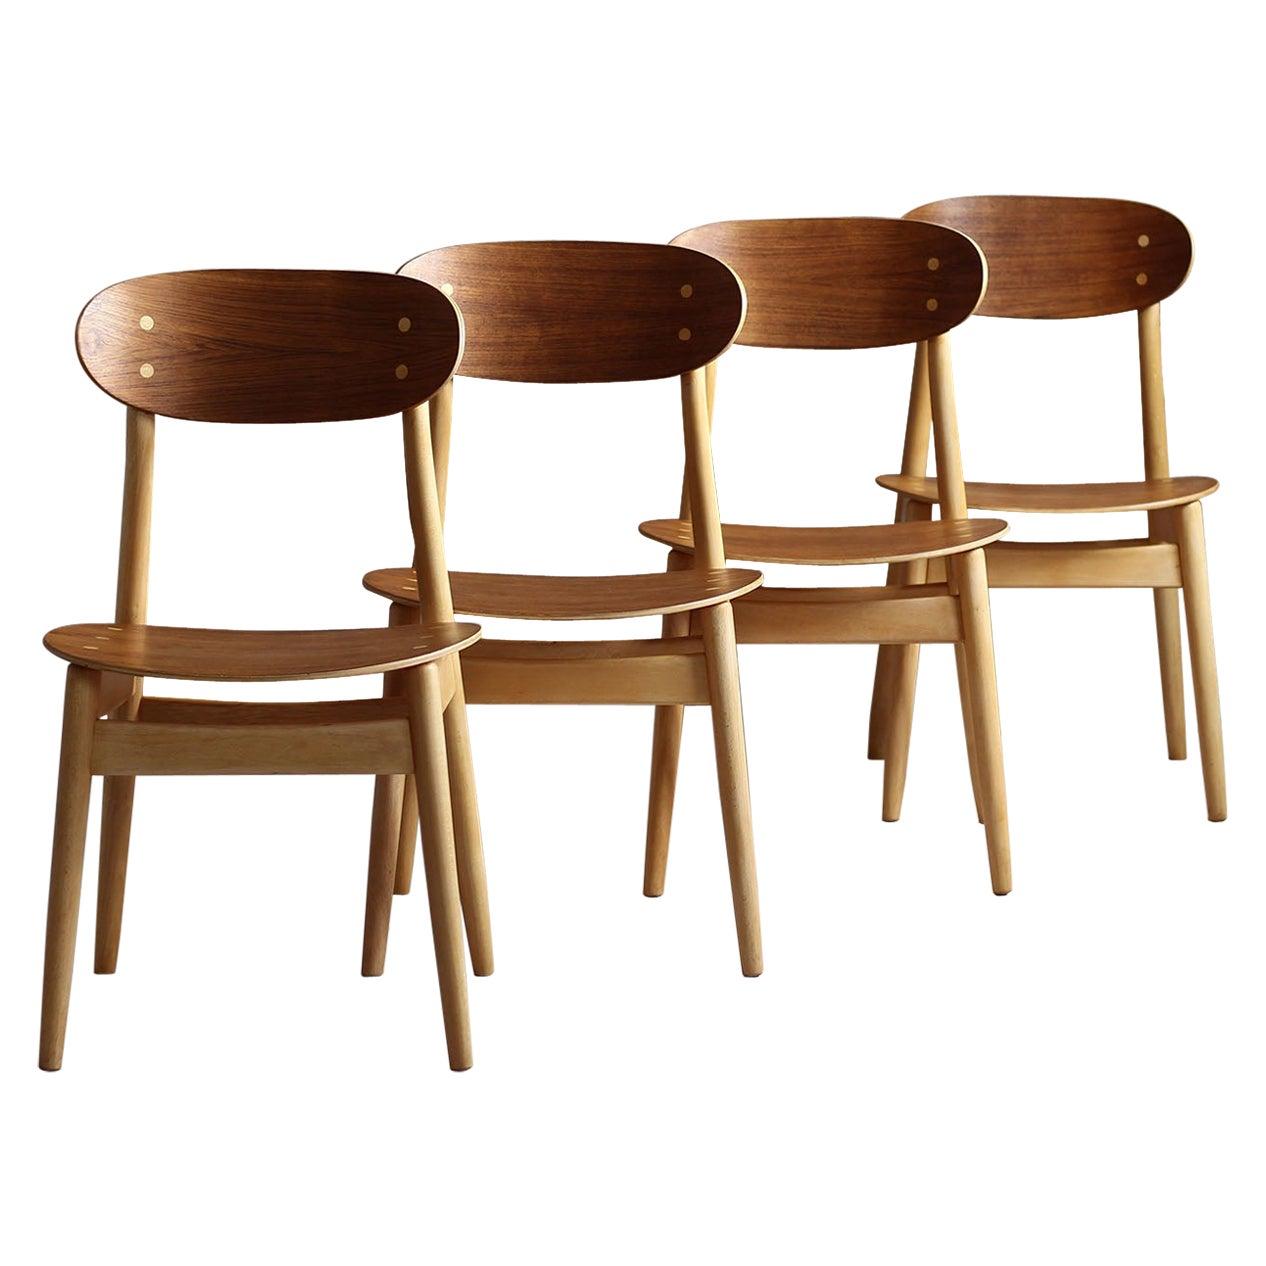 Set of 4 Dining Chairs by Sven Erik Fryklund for Hagafors, Sweden, 1960s